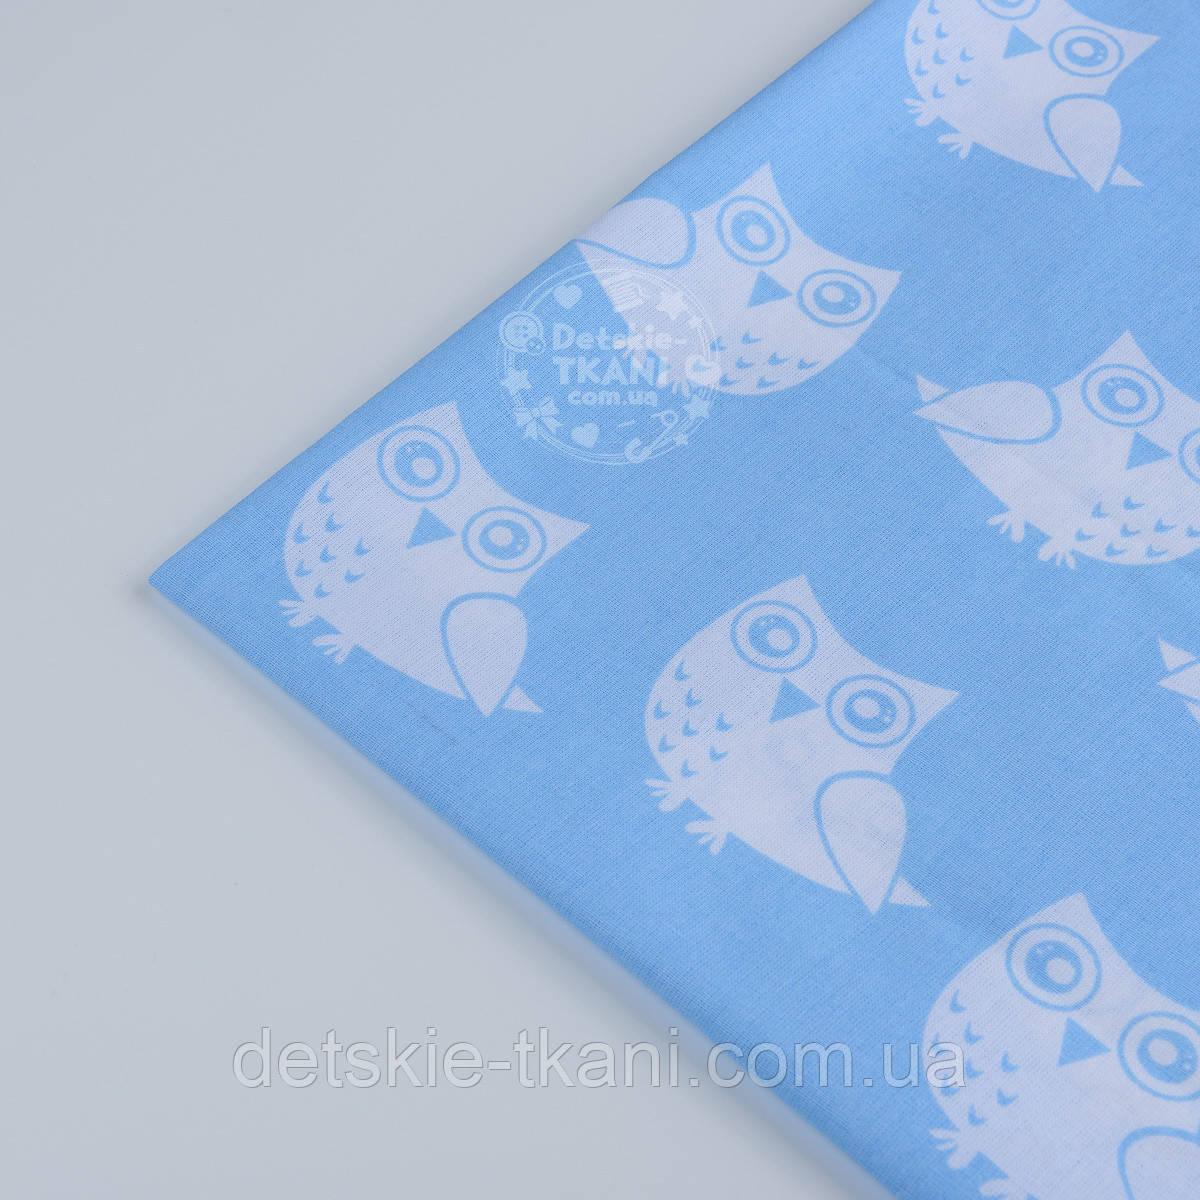 Отрез ткани №71  с белыми совами на голубом